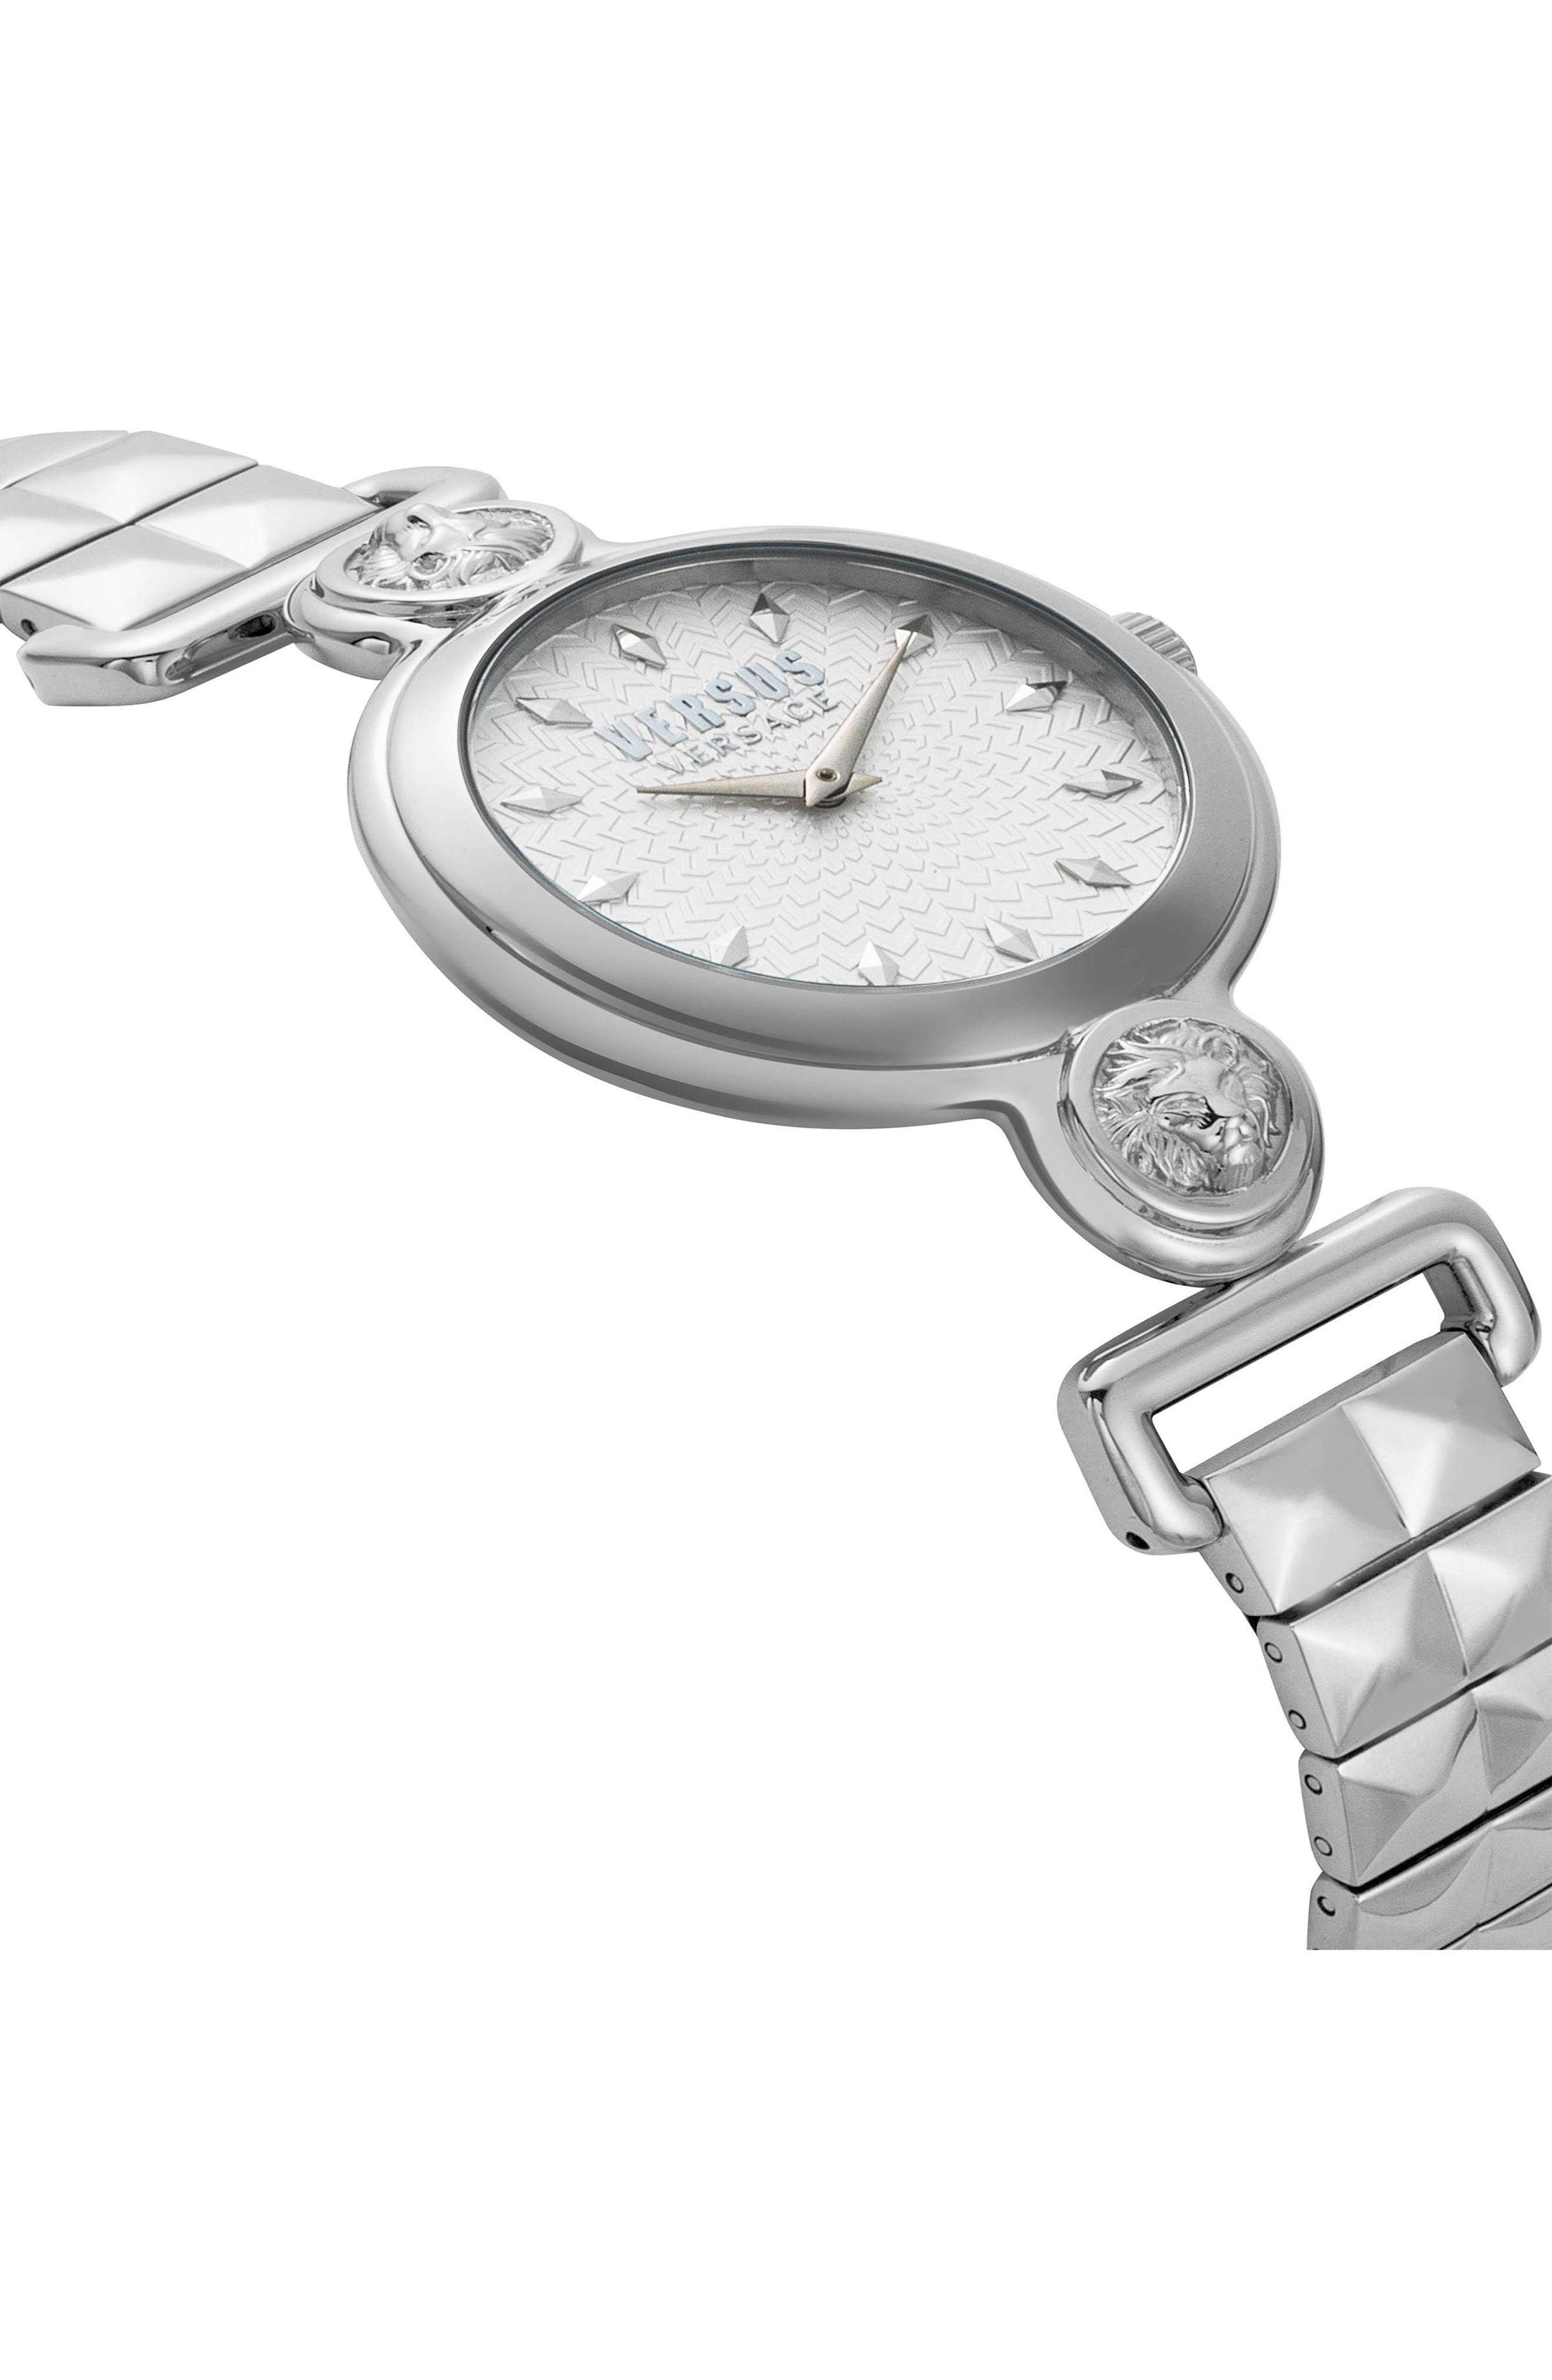 VERSUS VERSACE, Sunnyridge Bracelet Watch, 34mm, Alternate thumbnail 3, color, SILVER